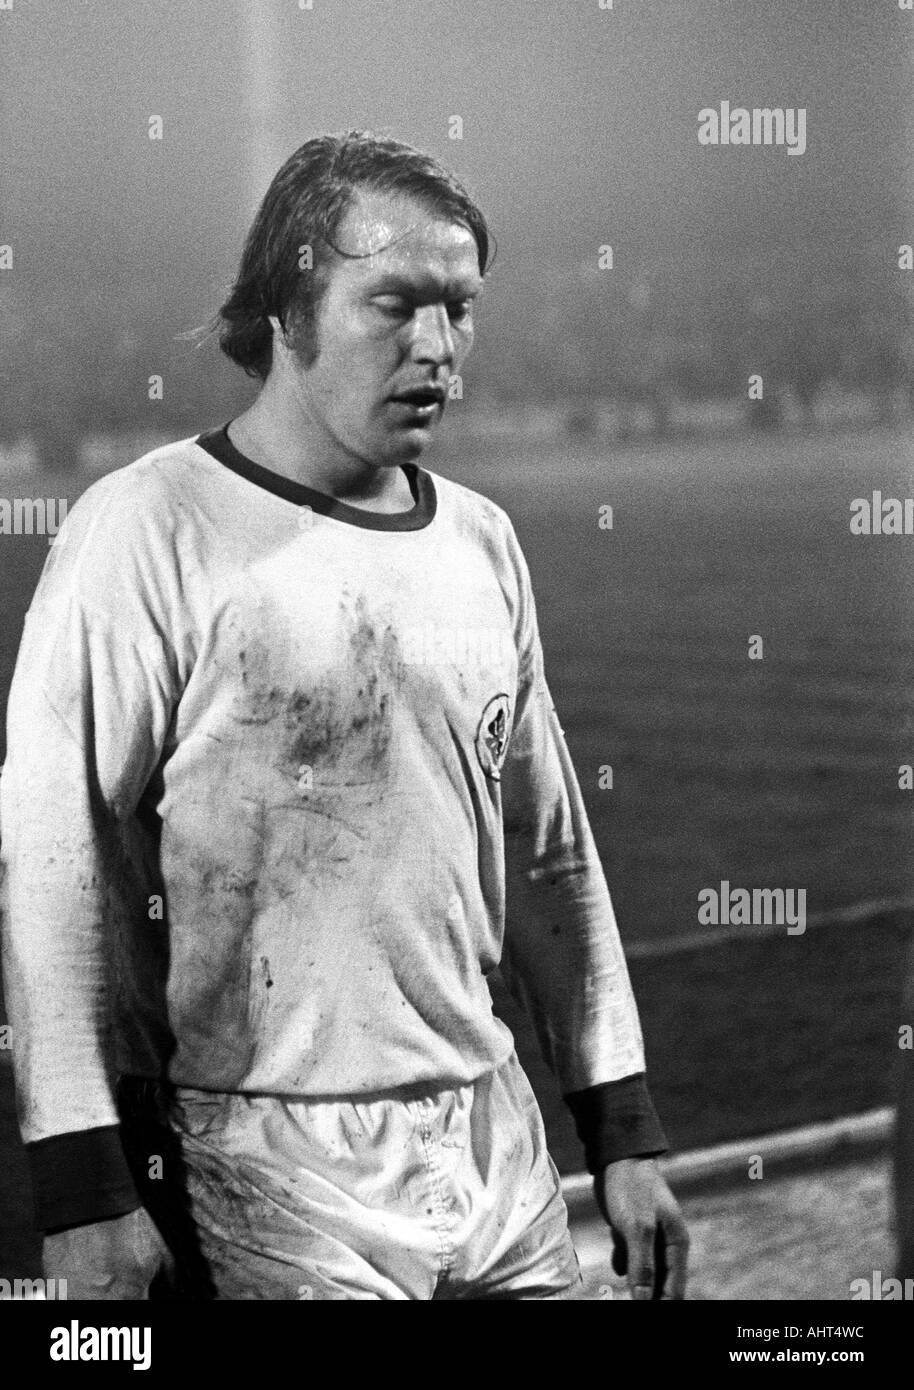 football, Bundesliga, 1970/1971, Niederrhein Stadium, Rot-Weiss Oberhausen versus Hanover 96 4:3, football player, Stock Photo